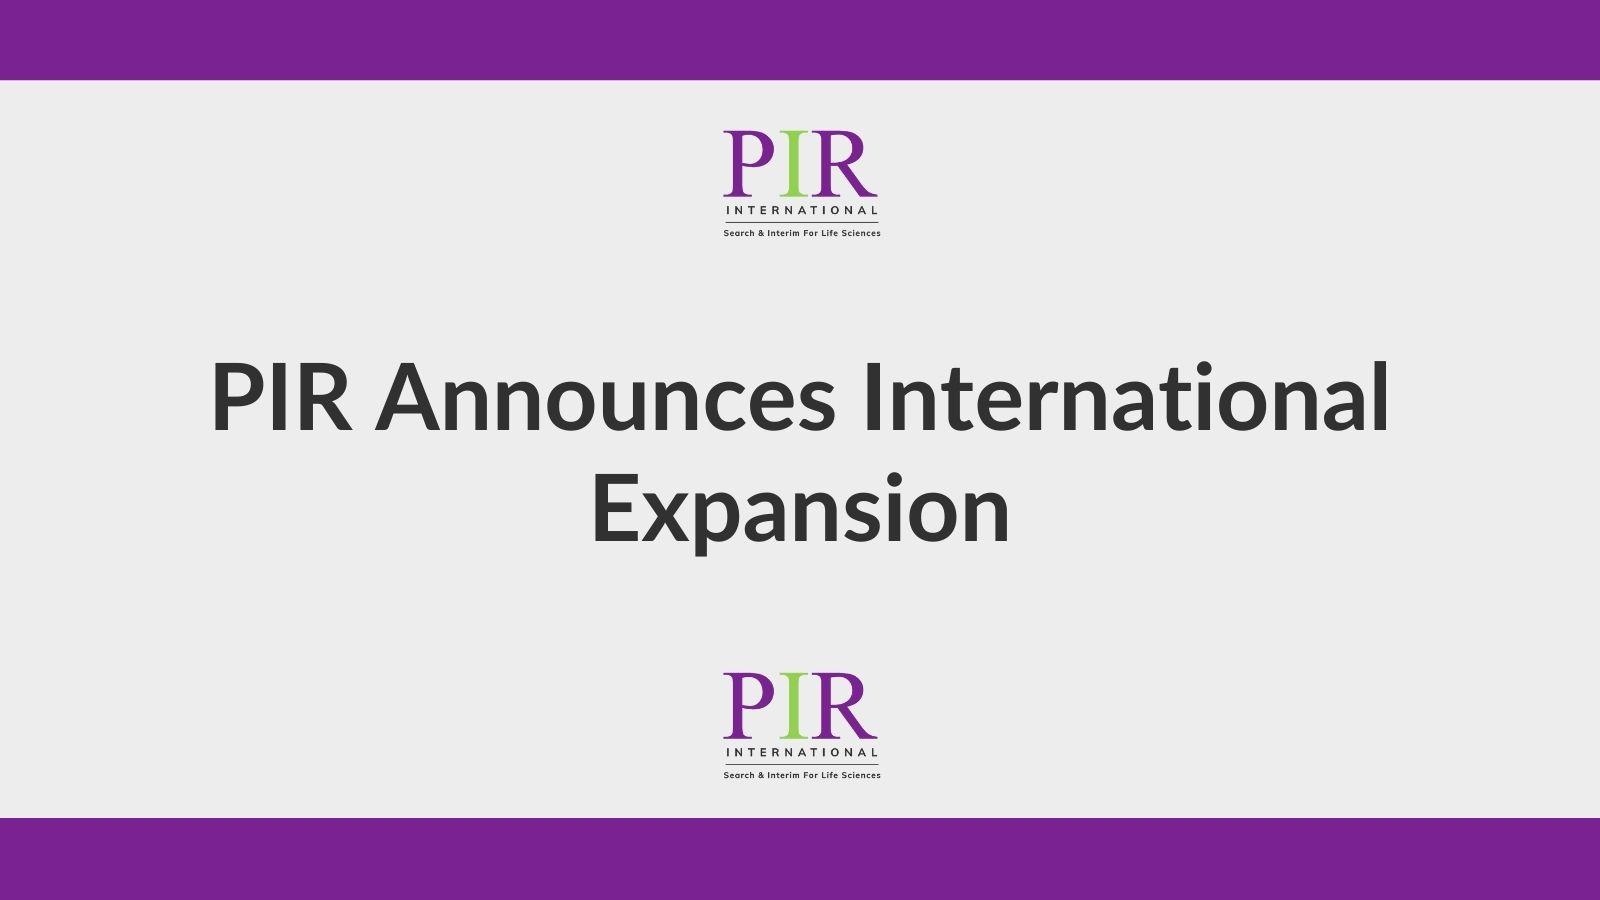 PIR Announces International Expansion